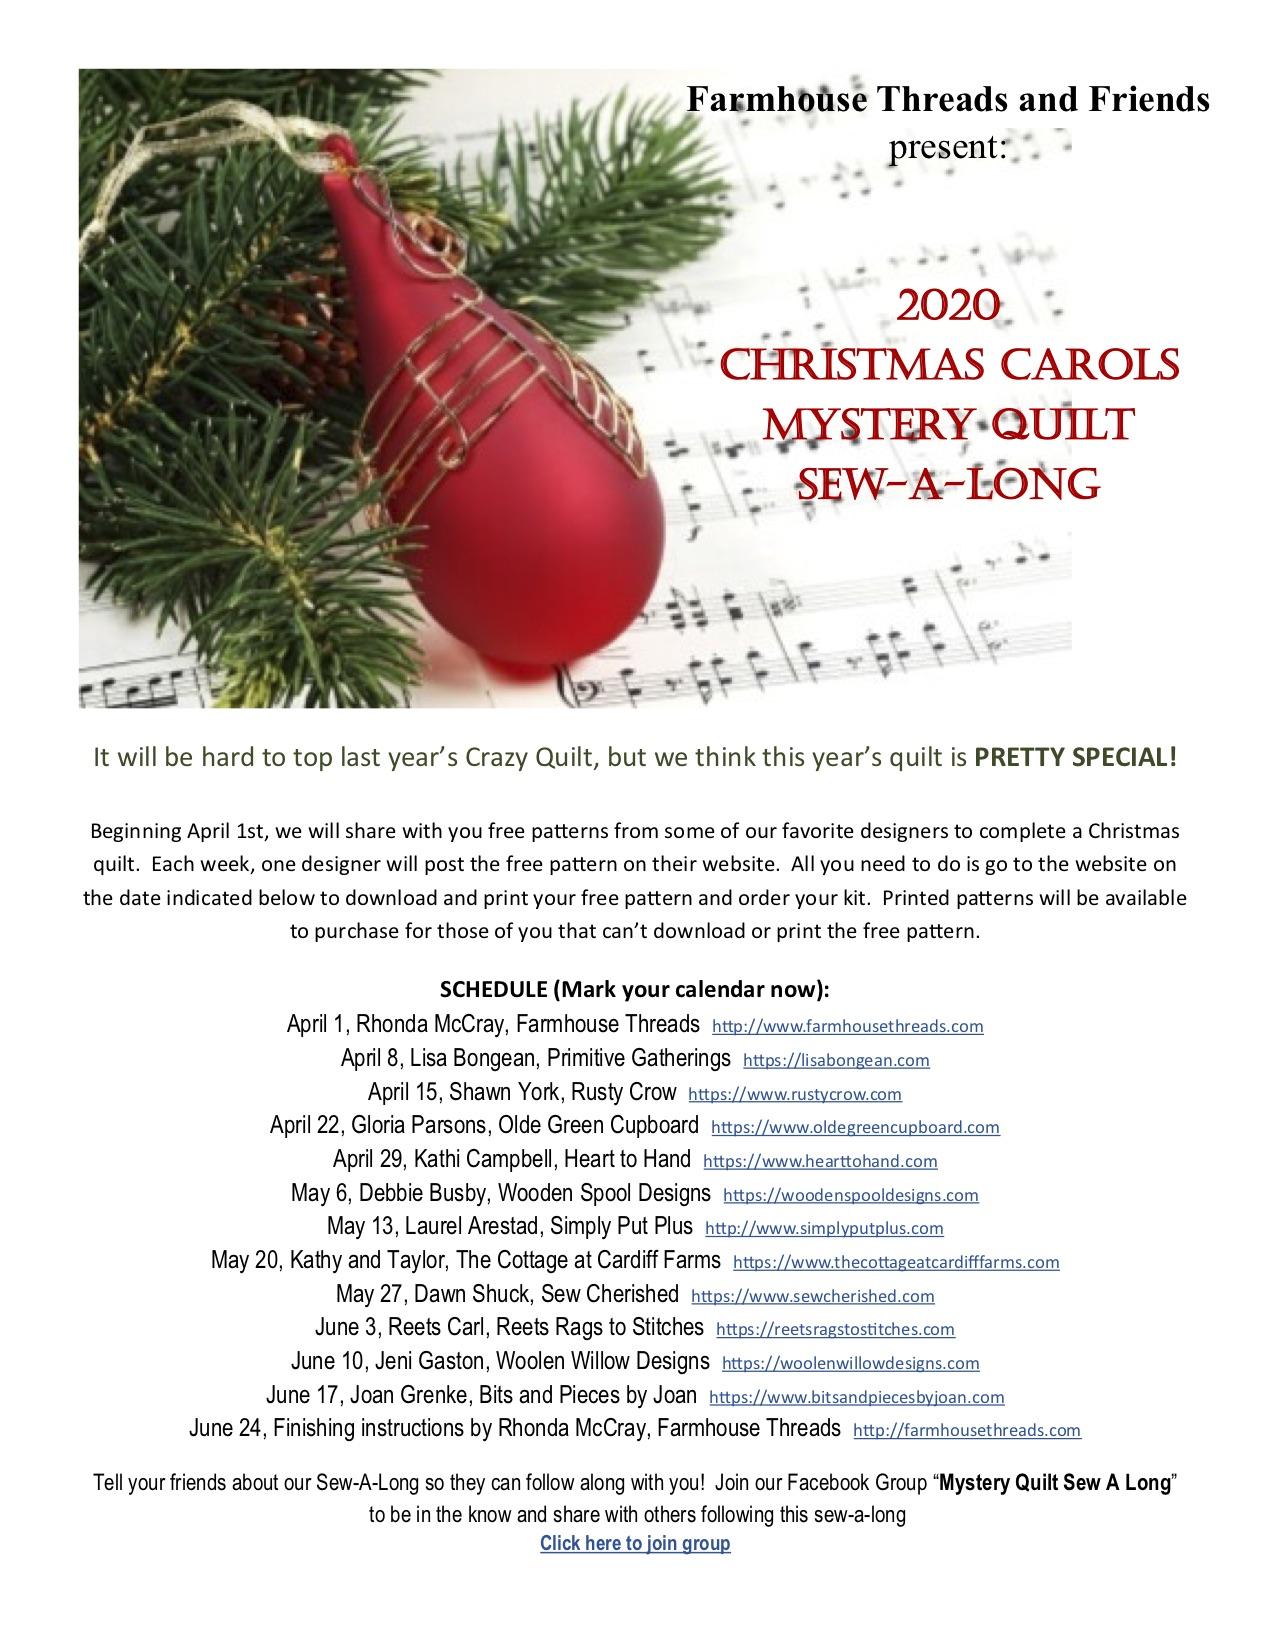 2020 Christmas Carols 2020 Christmas Carols Mystery Quilt Sew Along | Lisa Bongean